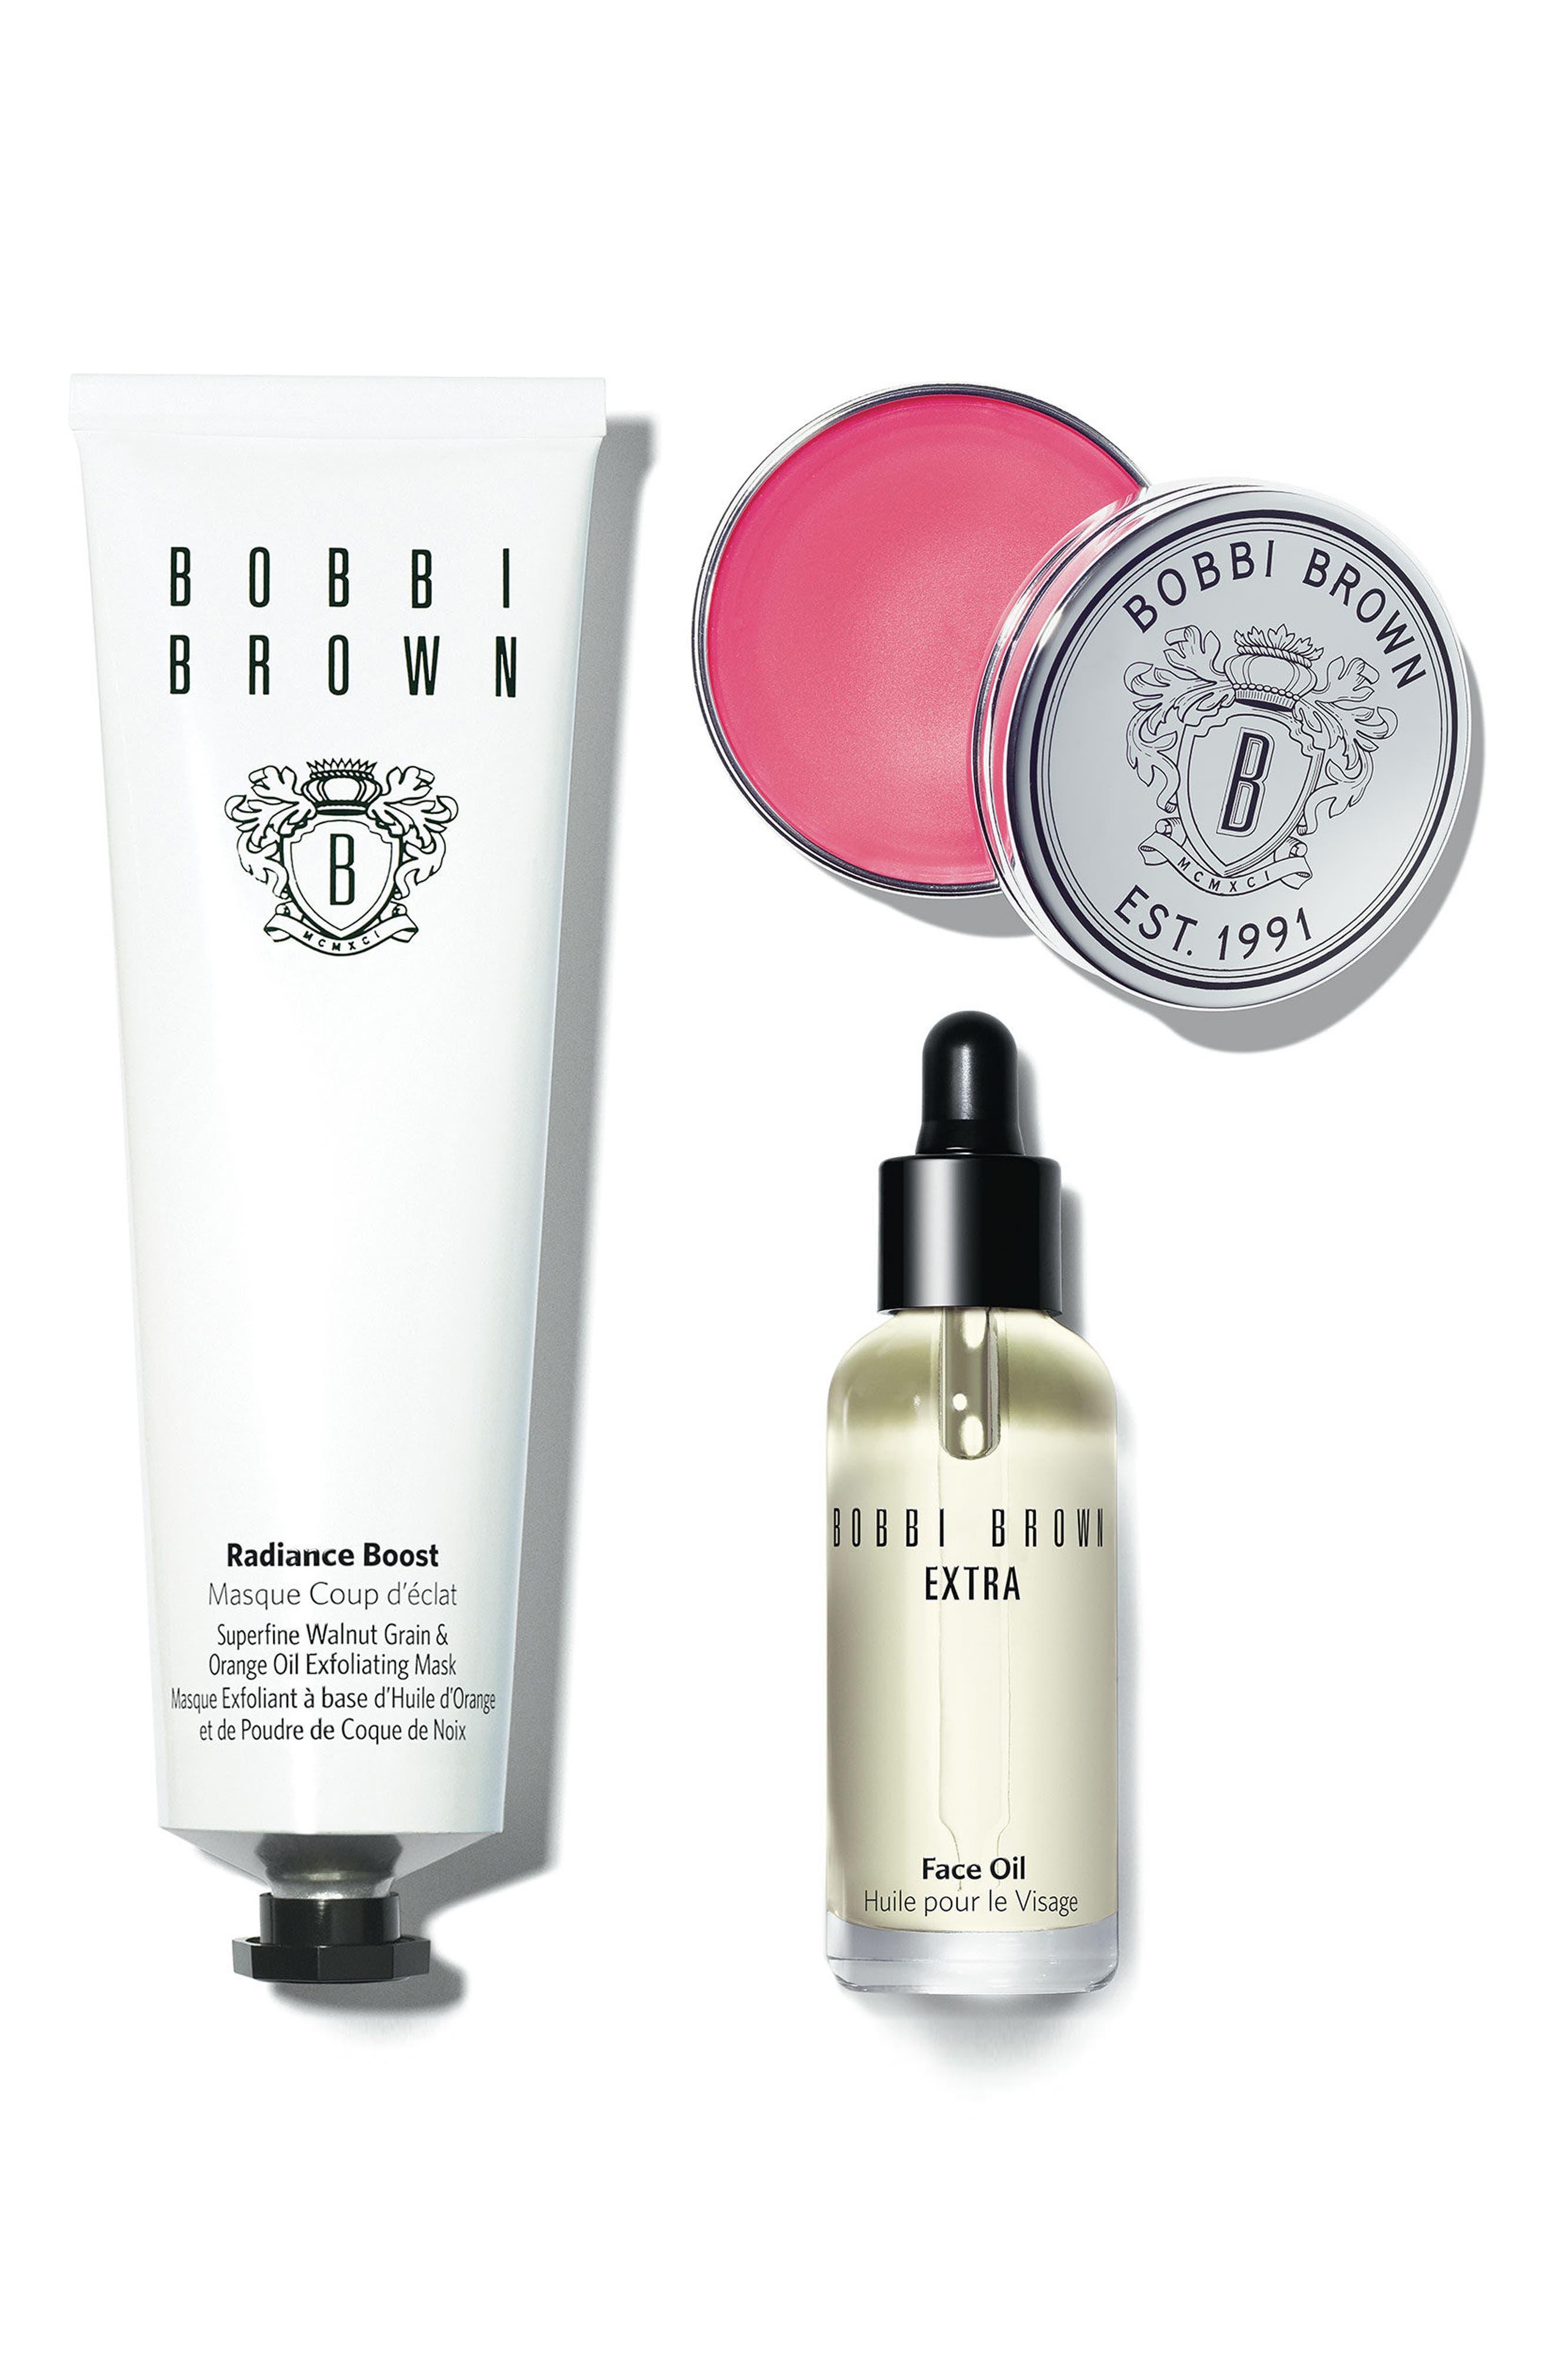 Bobbi Brown Glow Skin Care Trio ($93 Value)